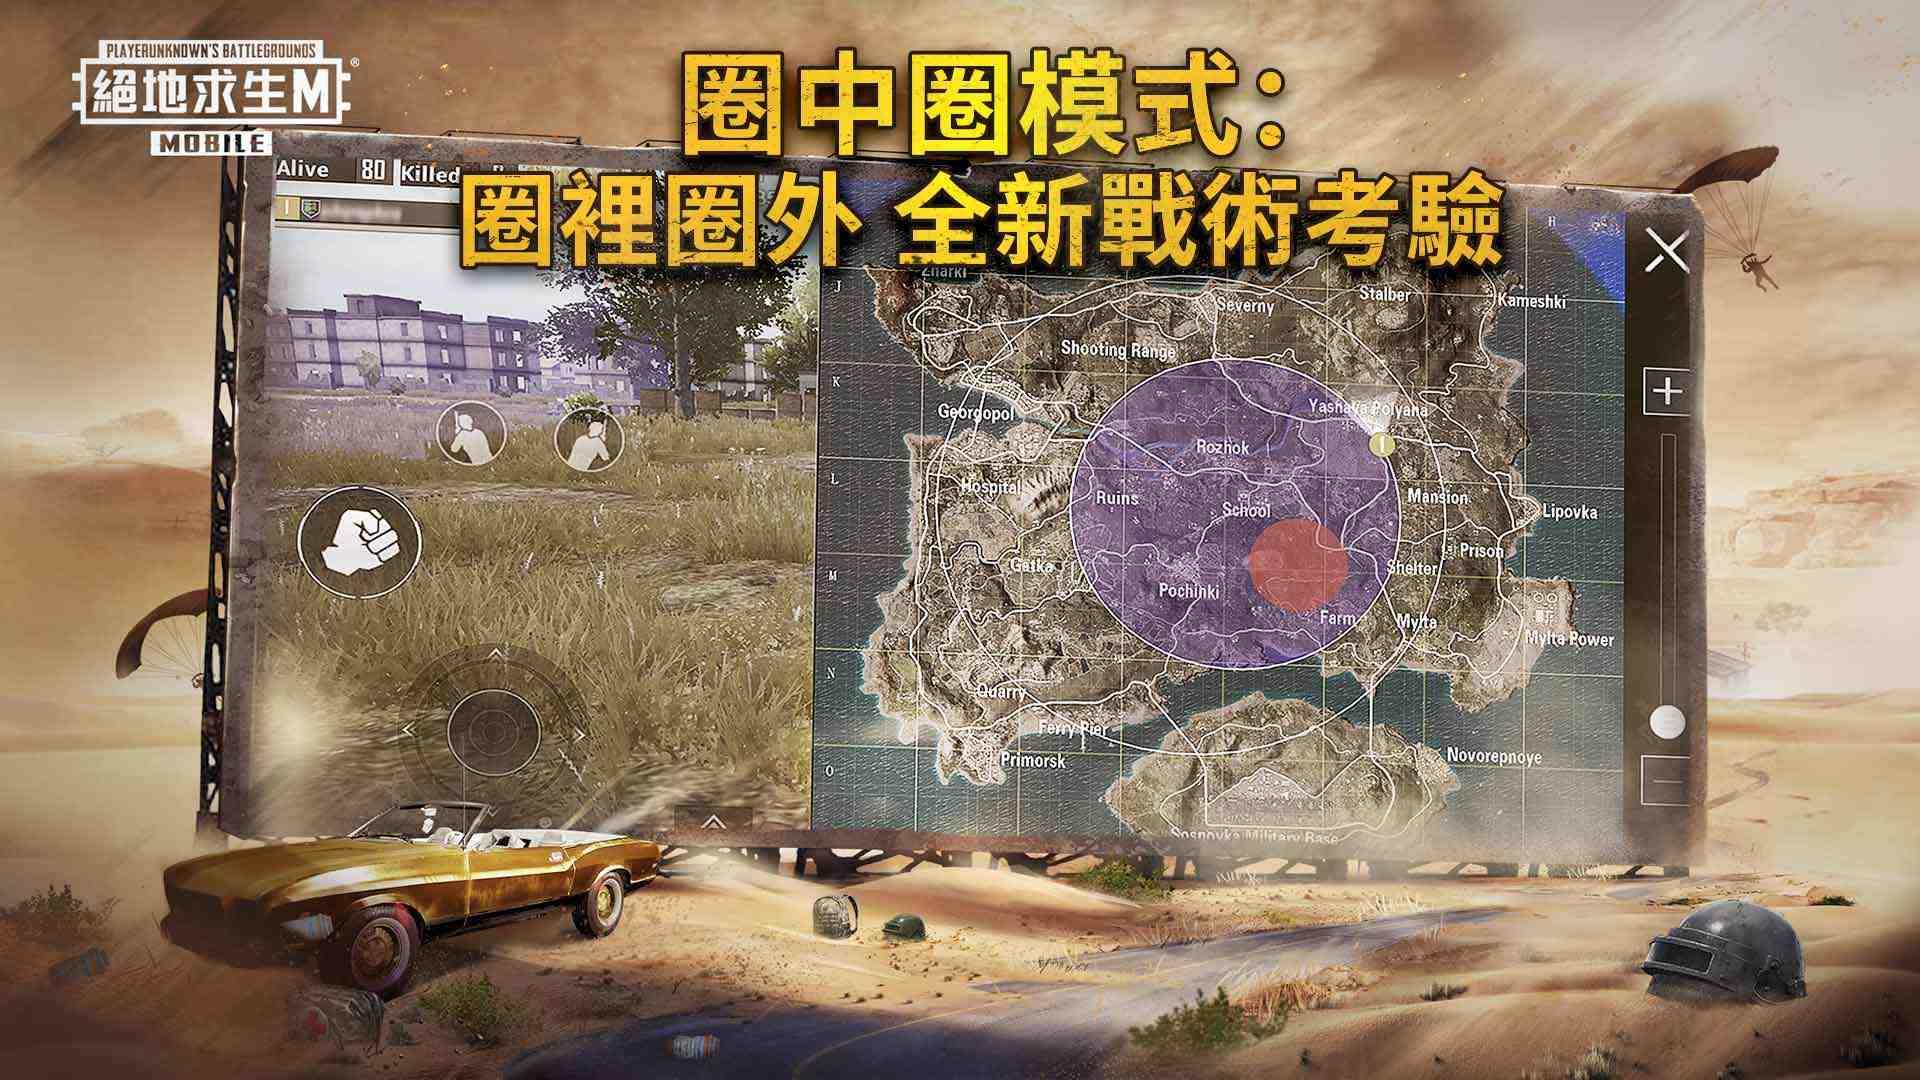 《PUBG MOBILE:絕地求生M》激情沙漠全新升級,沙塵暴即將來襲!你準備好迎戰了嗎?